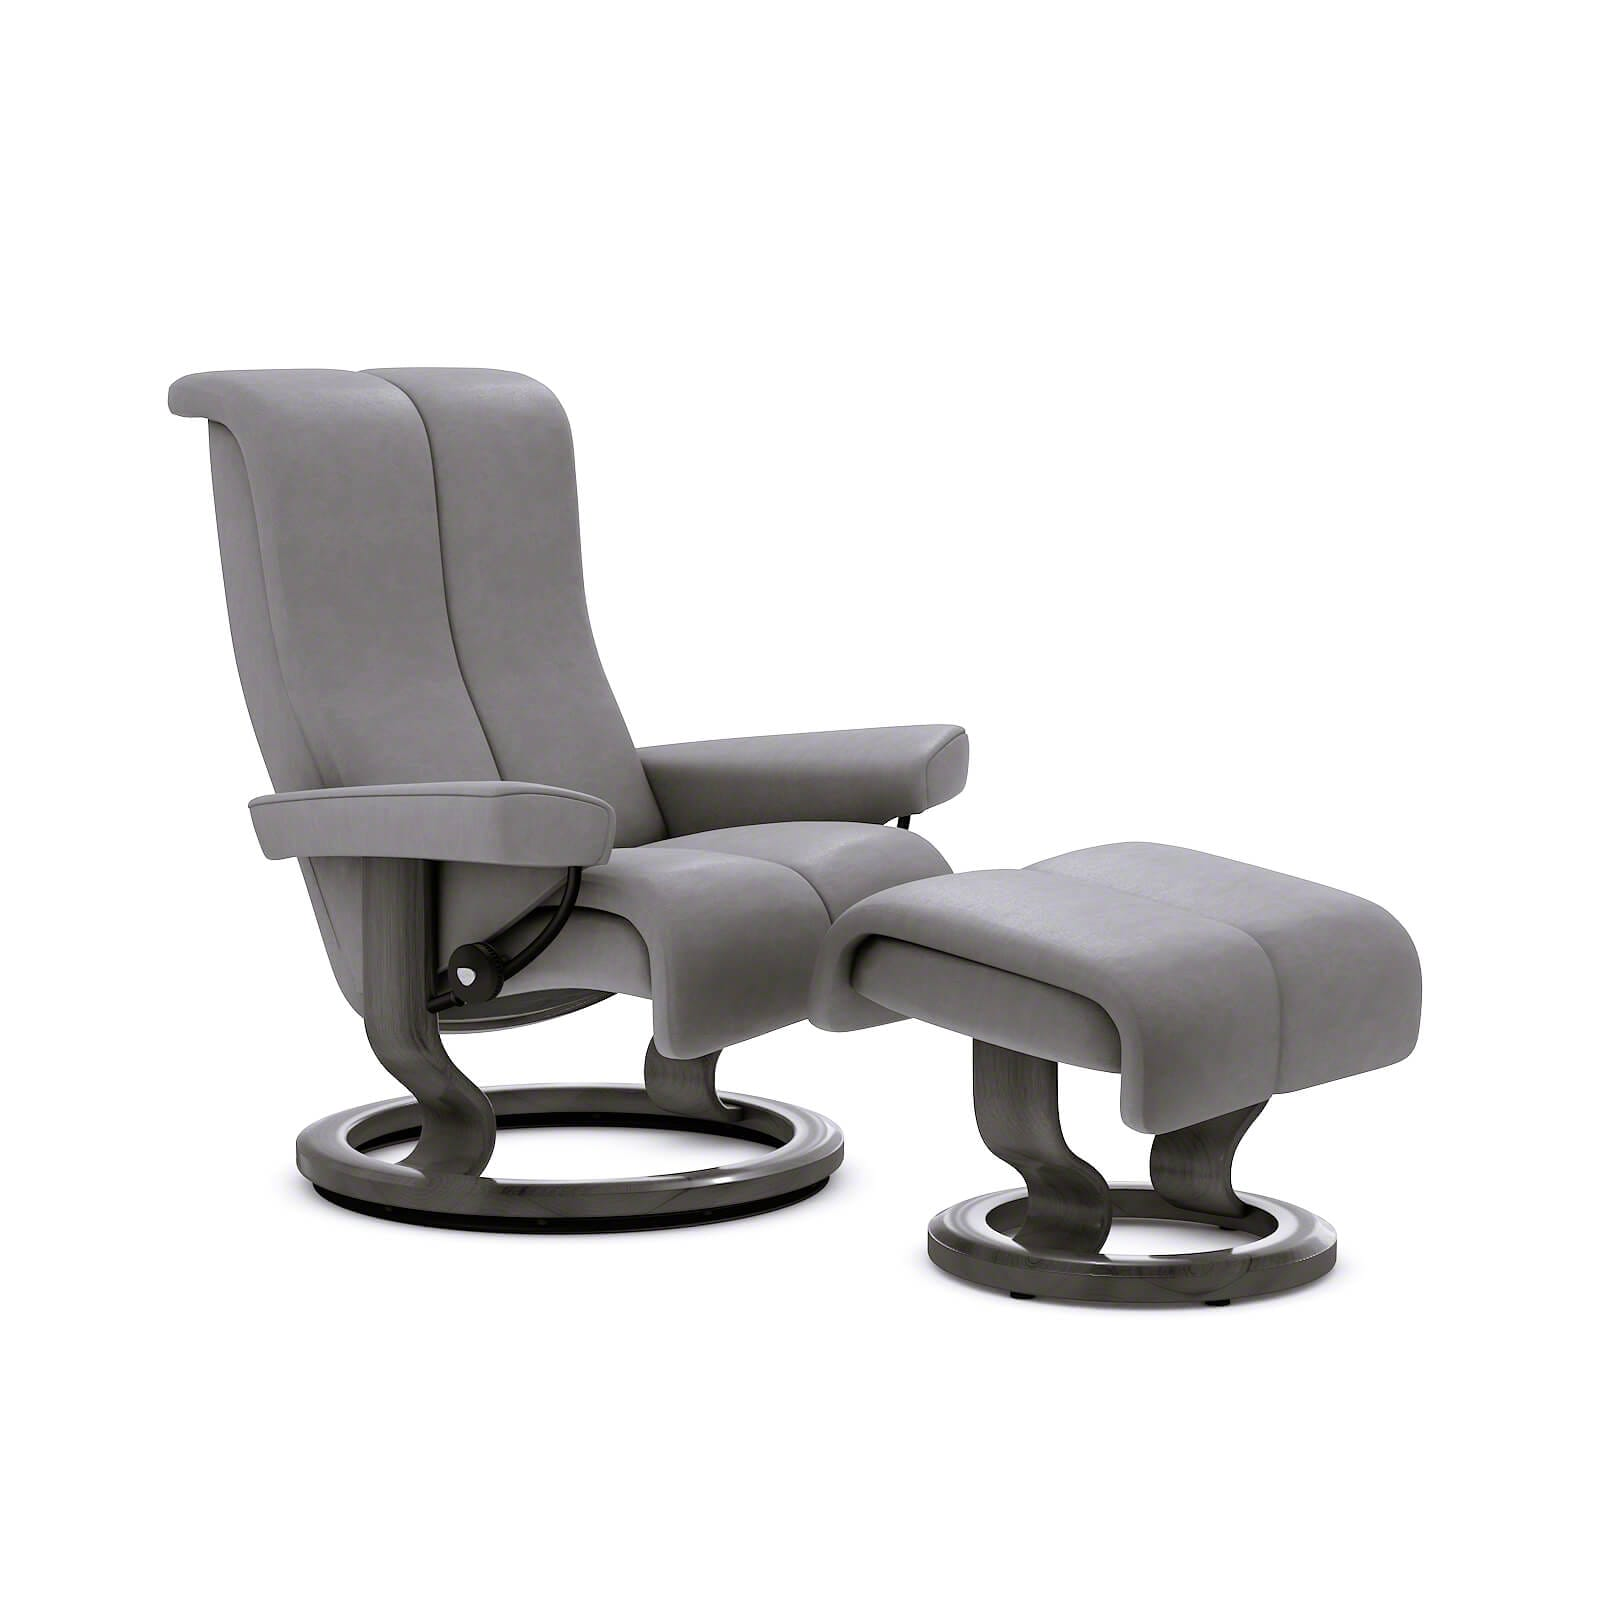 stressless piano noblesse grau classic grau hocker stressless. Black Bedroom Furniture Sets. Home Design Ideas